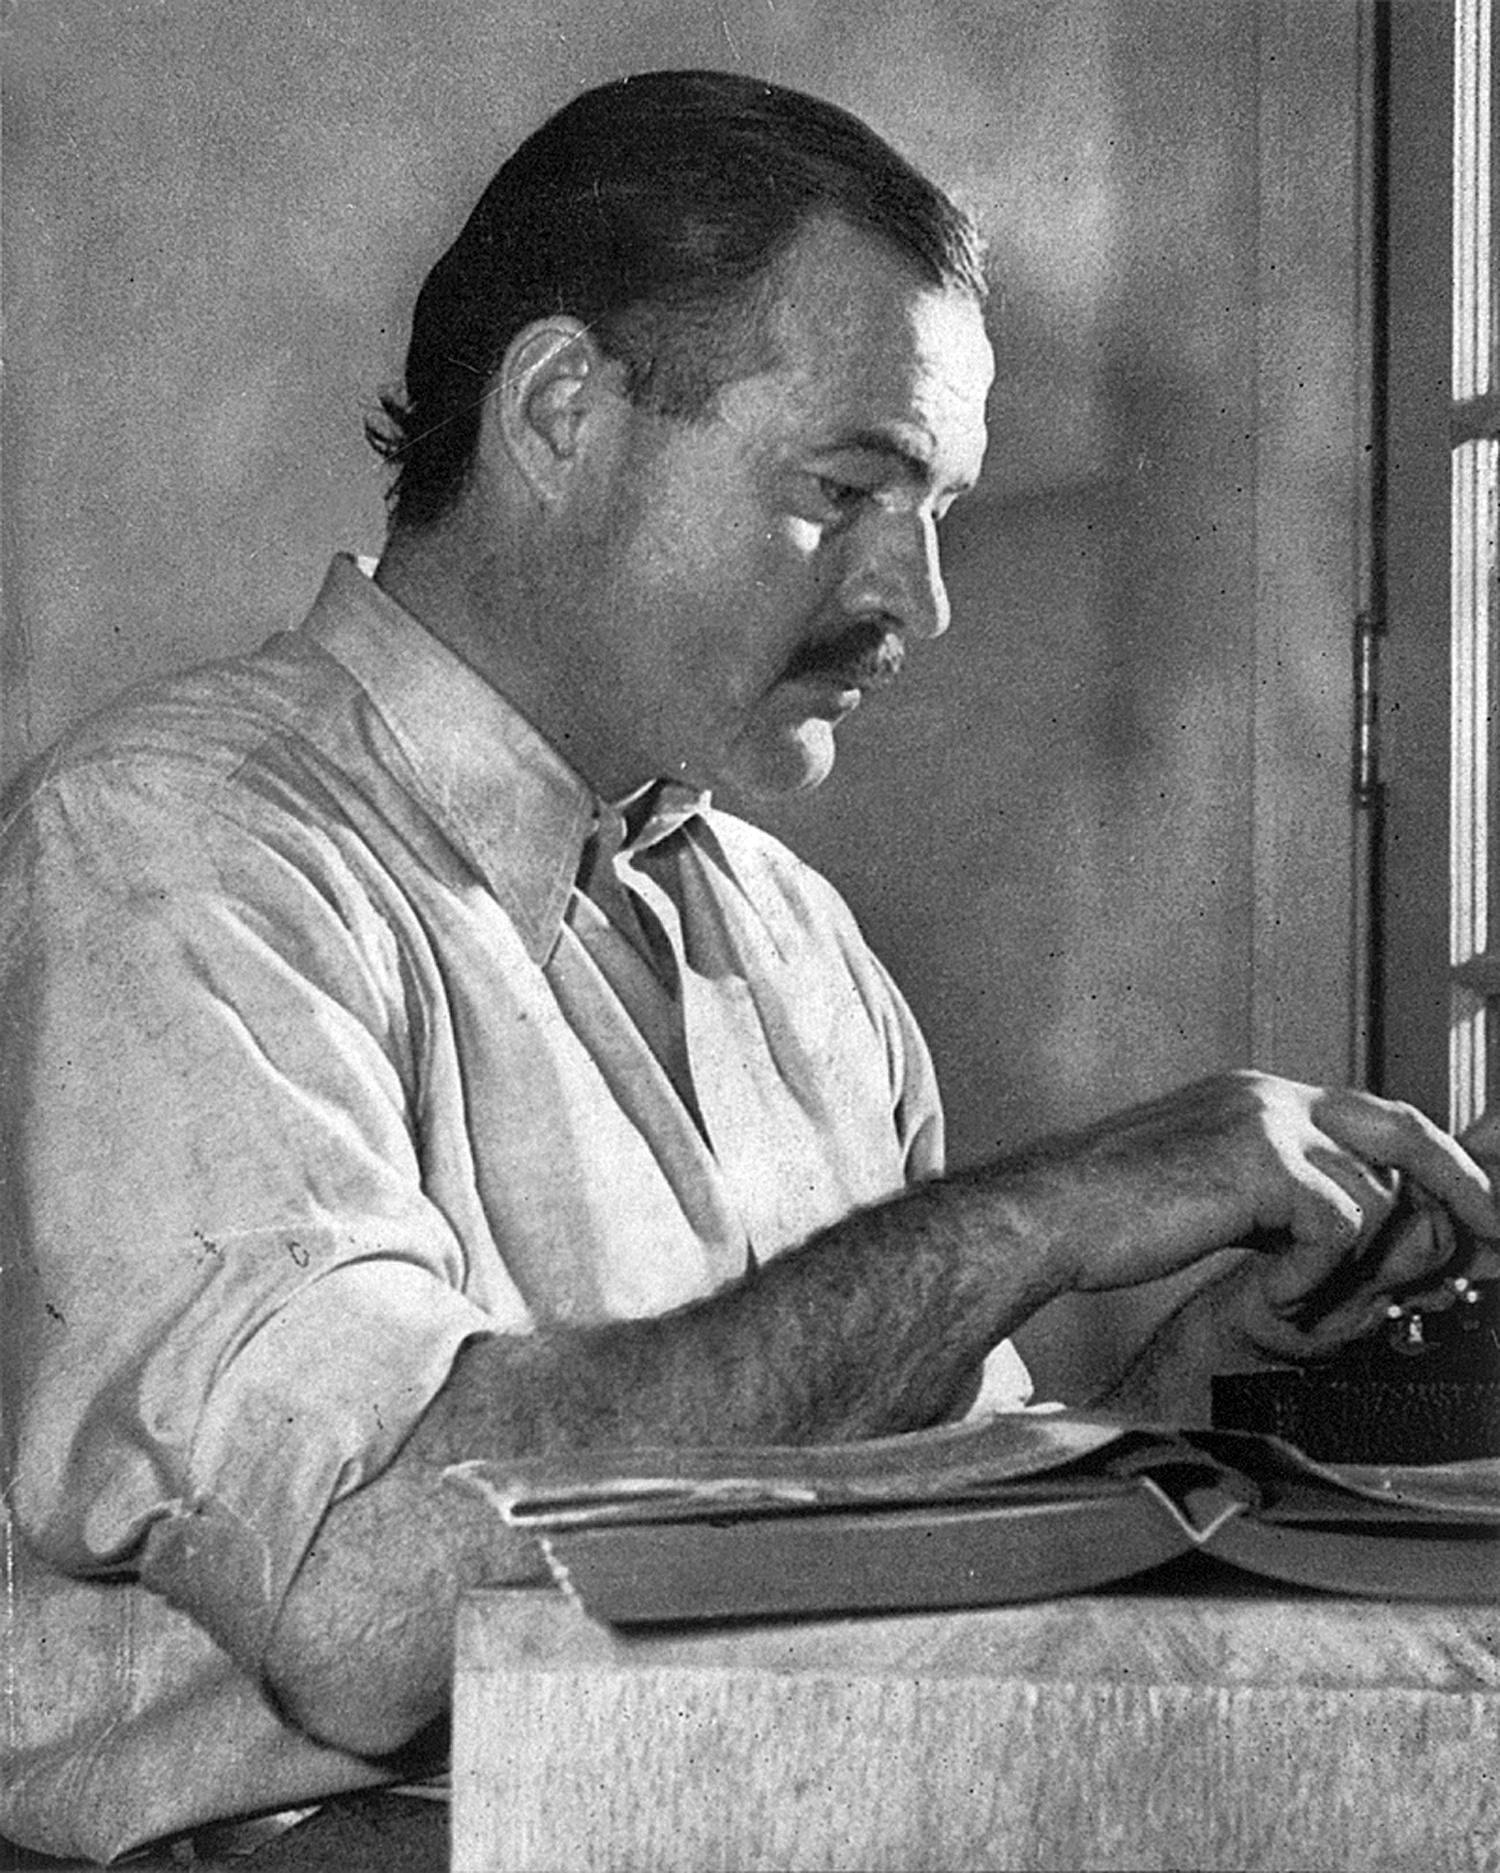 "2894281babc0e765cb2672444e3a5678 - The Sun Has Risen on Hemingway's ""Clutter"" Archive"